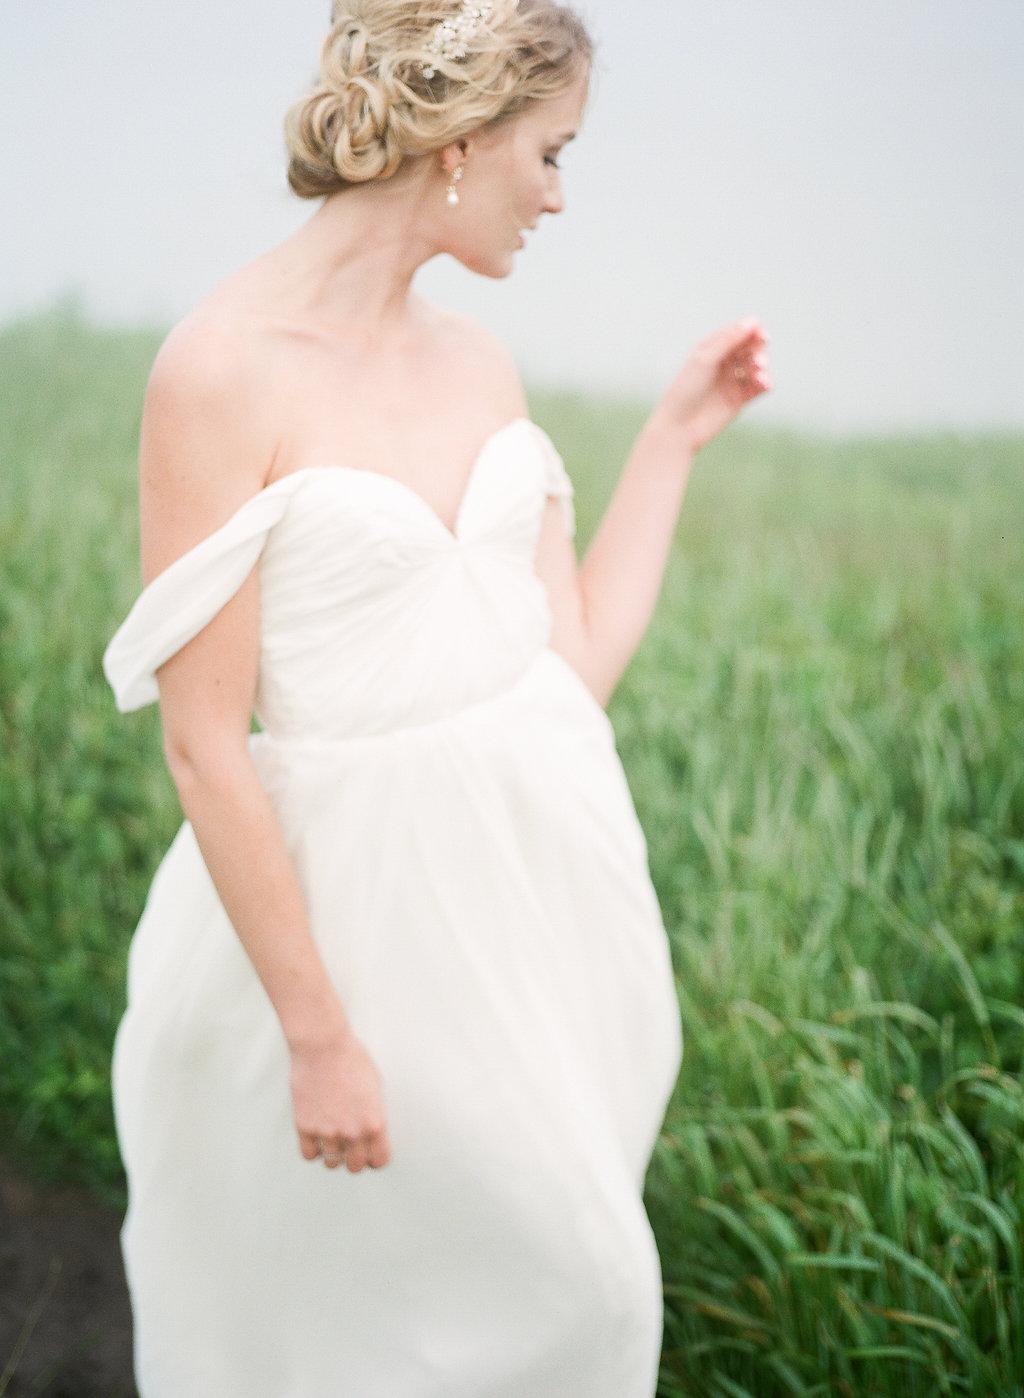 josie-photographs-urban-petals-mountain-wedding-north-carolina-mountain-wedding-ivory-and-beau-bridal-boutique-savannah-wedding-dresses-savannah-bridal-boutique-savannah-wedding-gowns-sarah-seven-lafayette-sarah-seven-wedding-dress-boho-bride-6.jpg